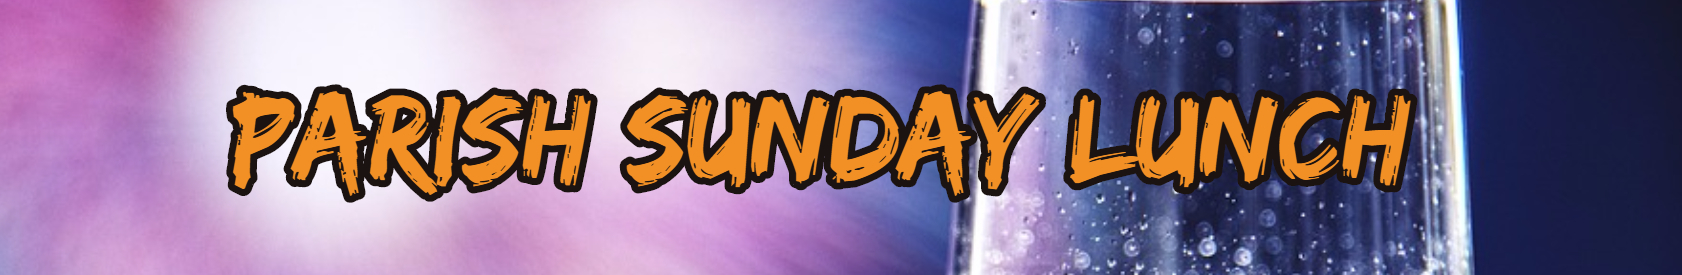 Parish Sunday Lunch – 14 July